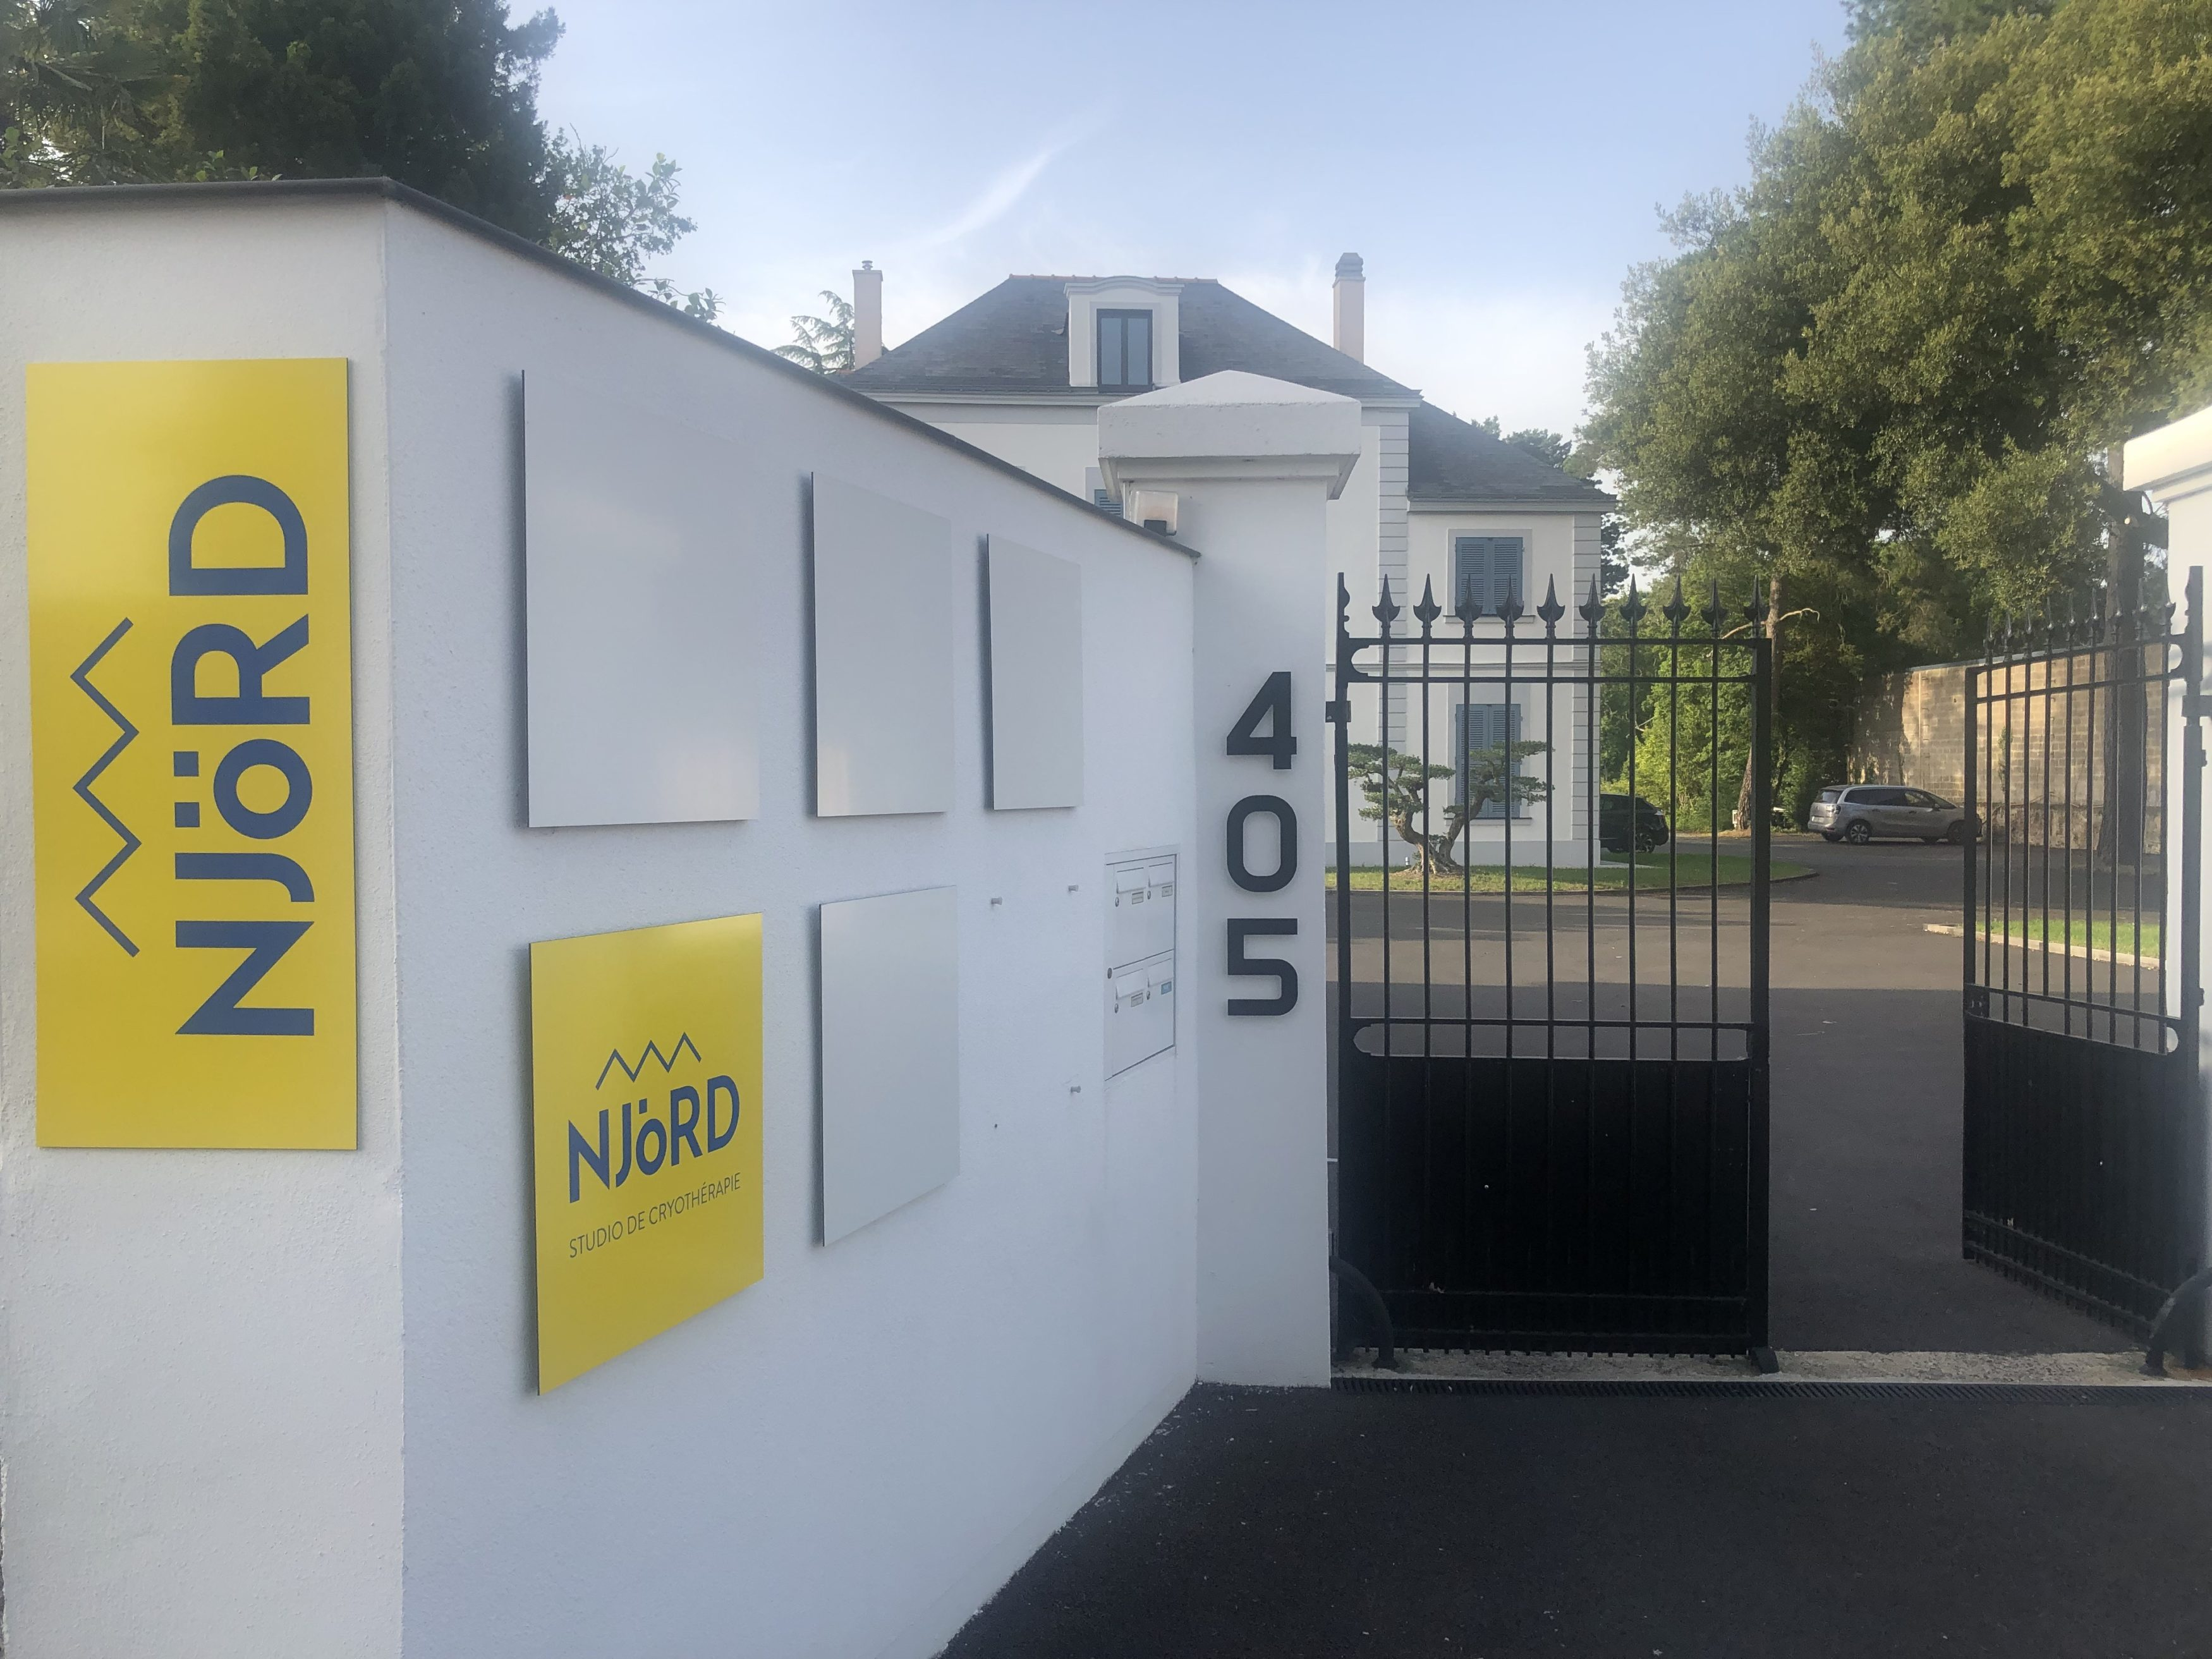 Entrée NjÖRD Studio de Nantes